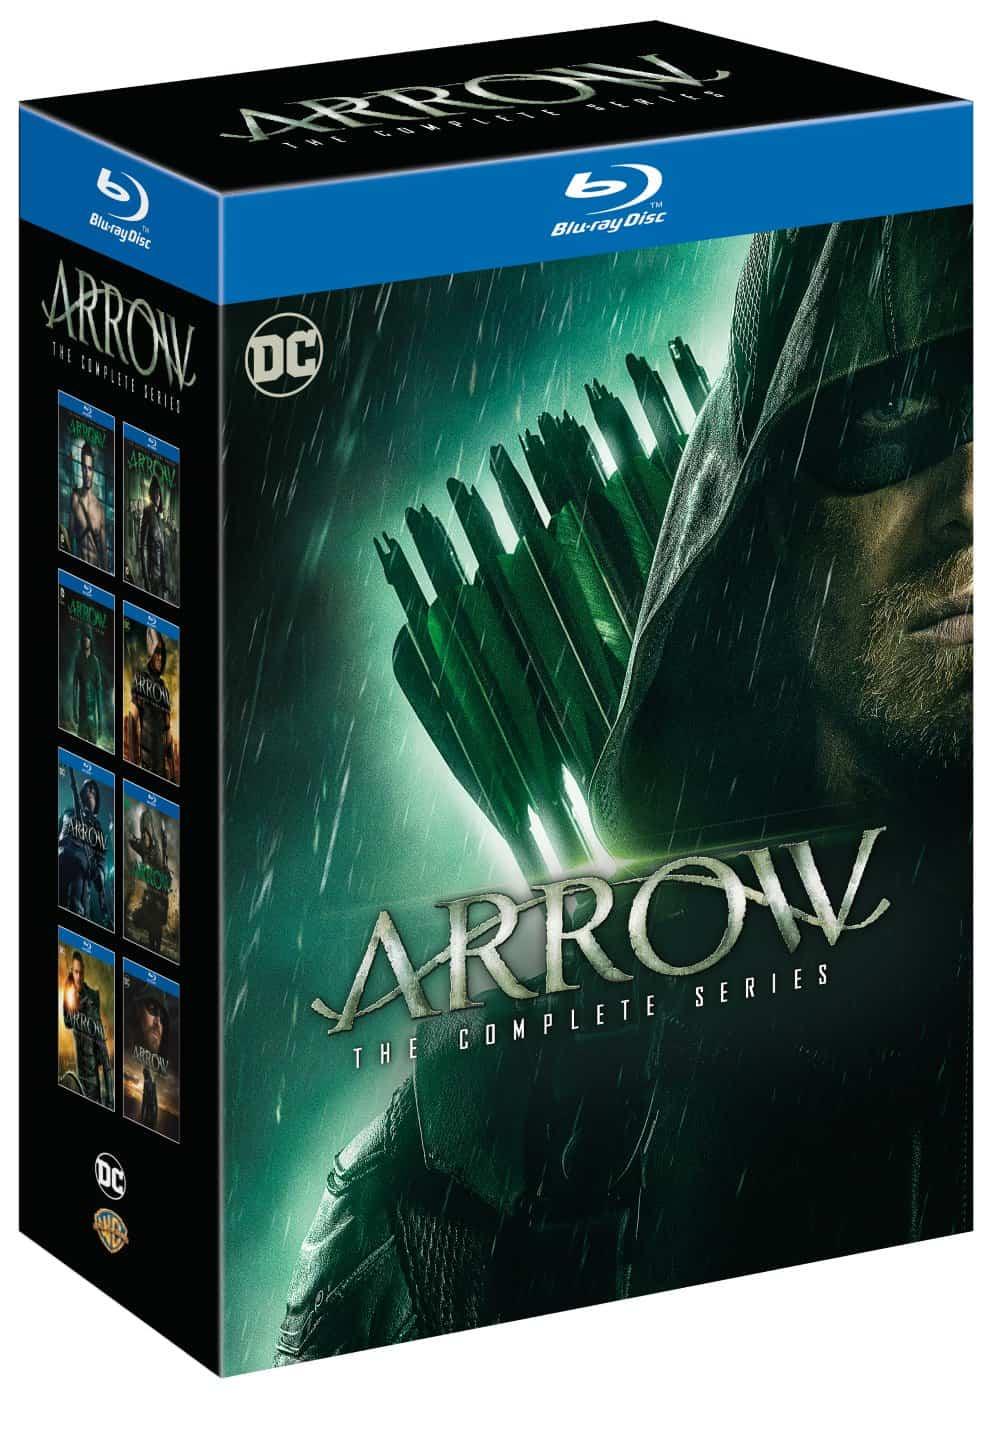 Arrow Blu-ray complete series CW